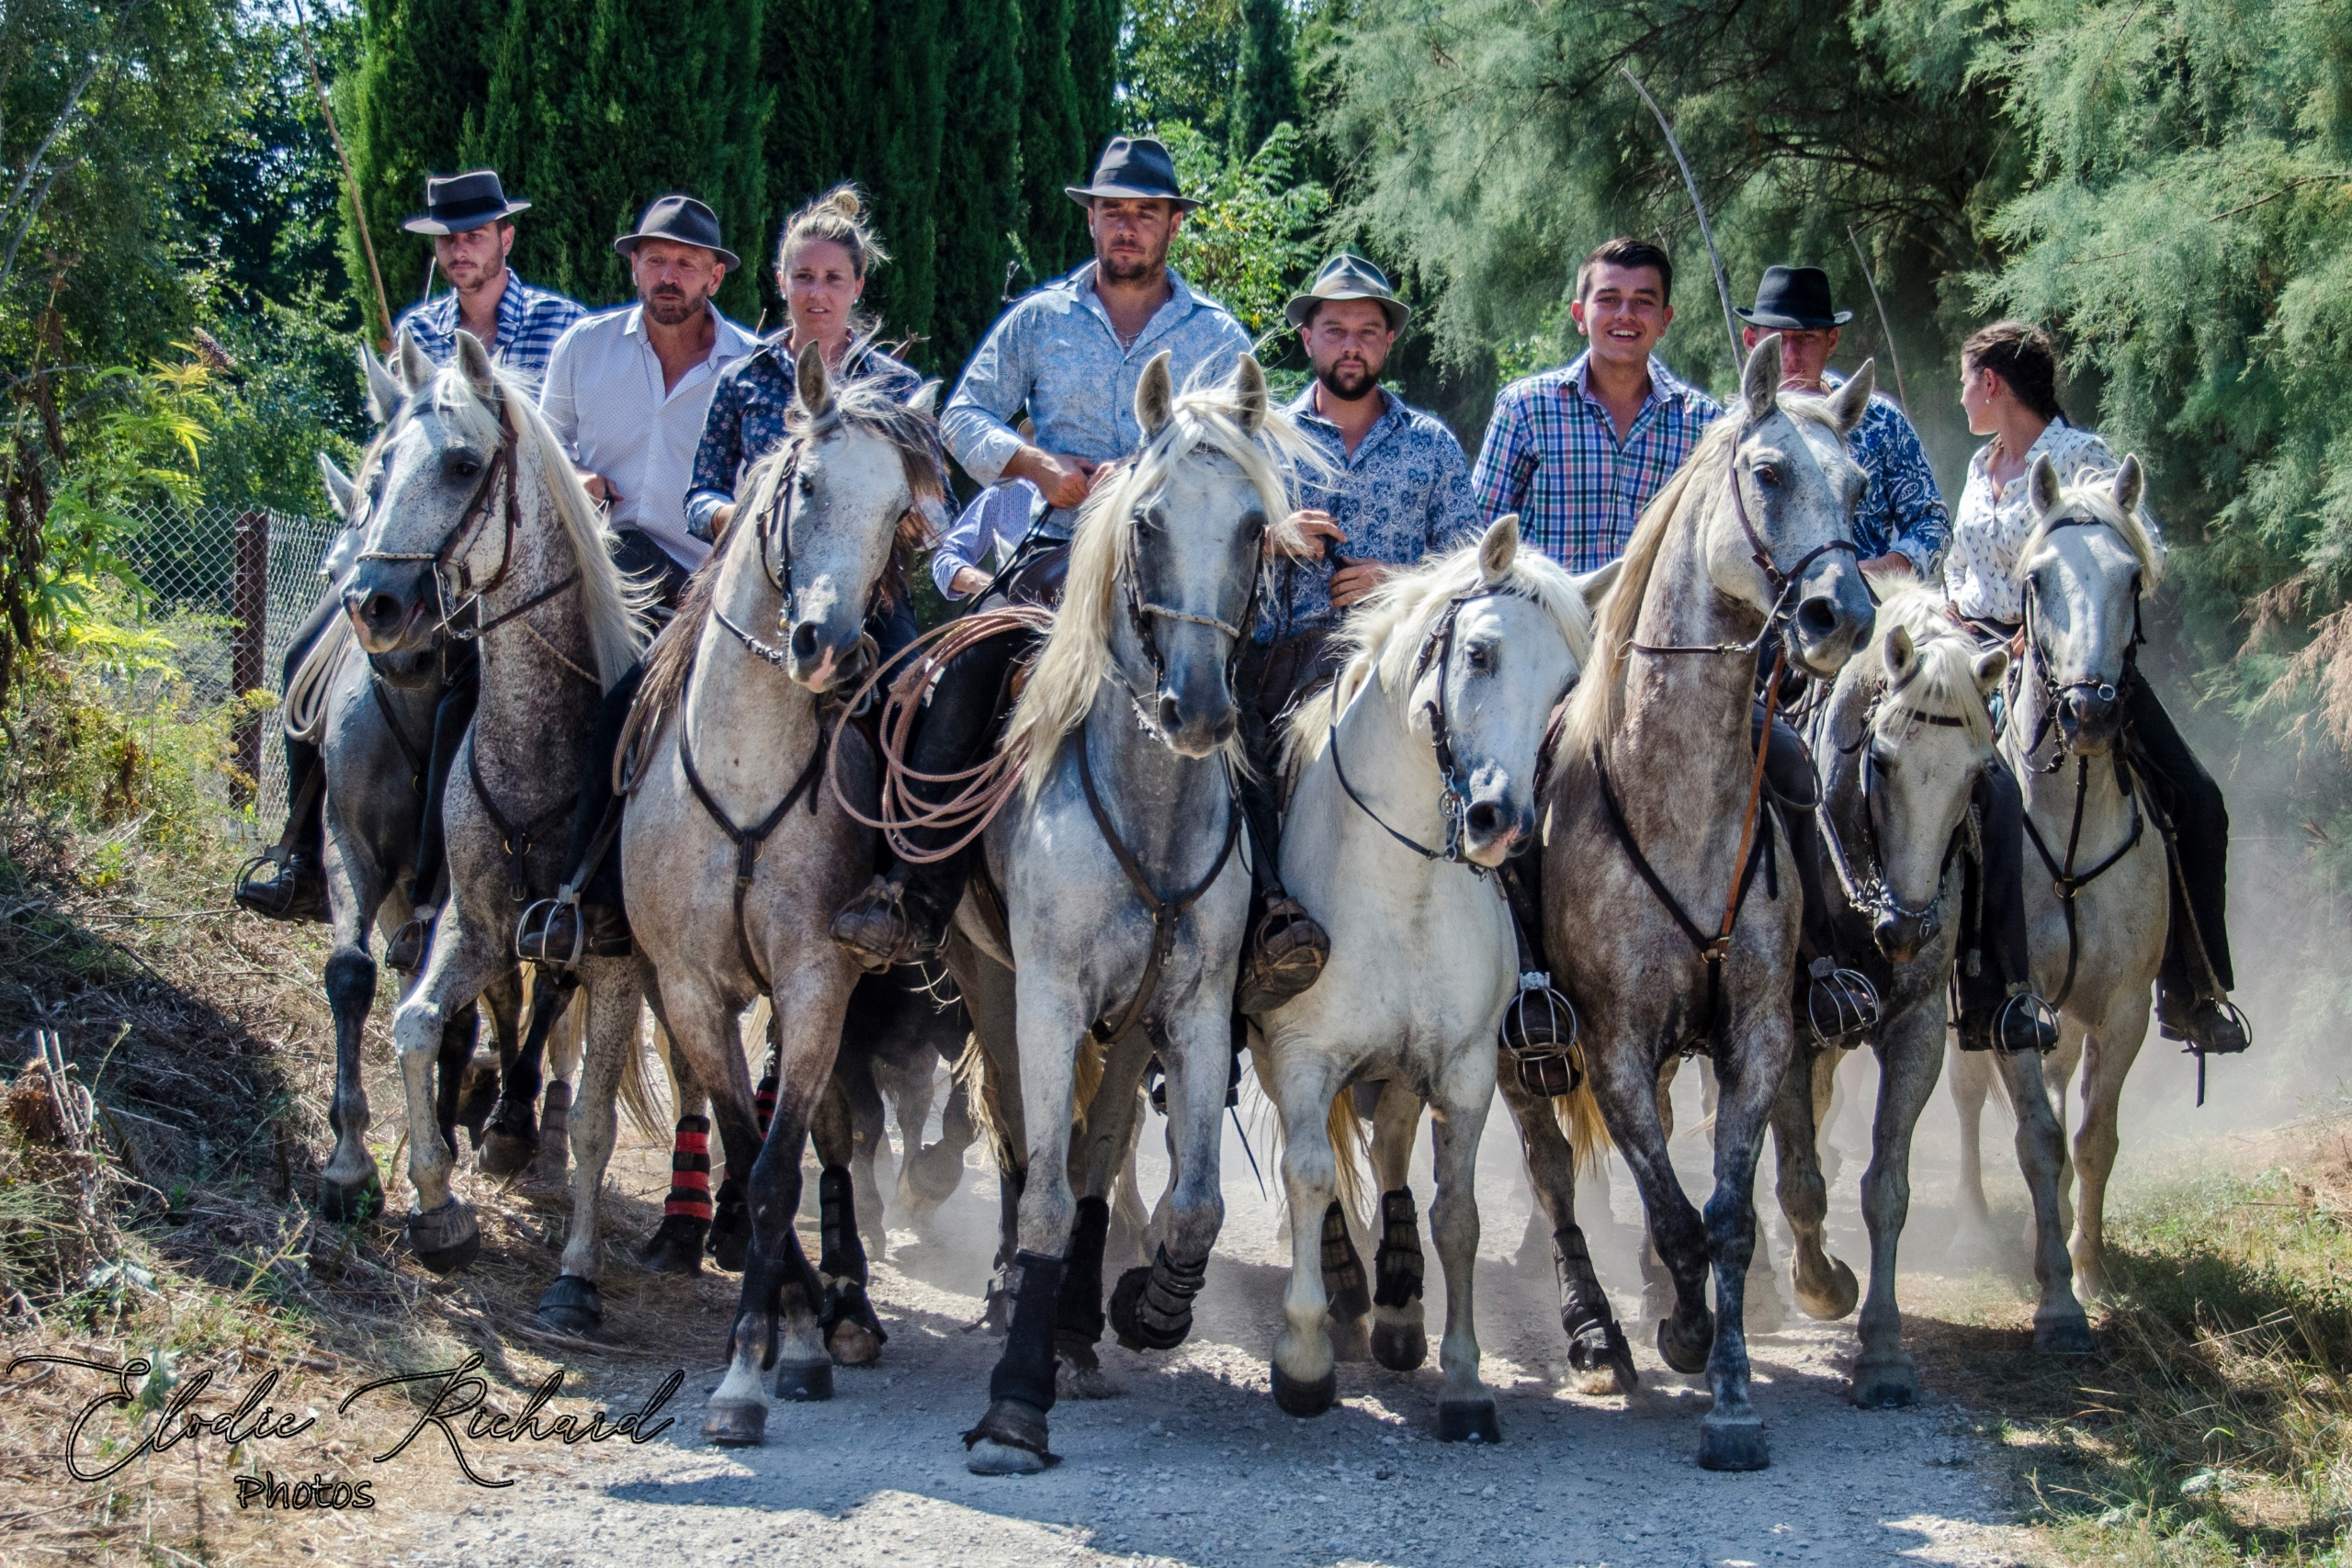 gardians cheval taureaux camargue abrivado tradition